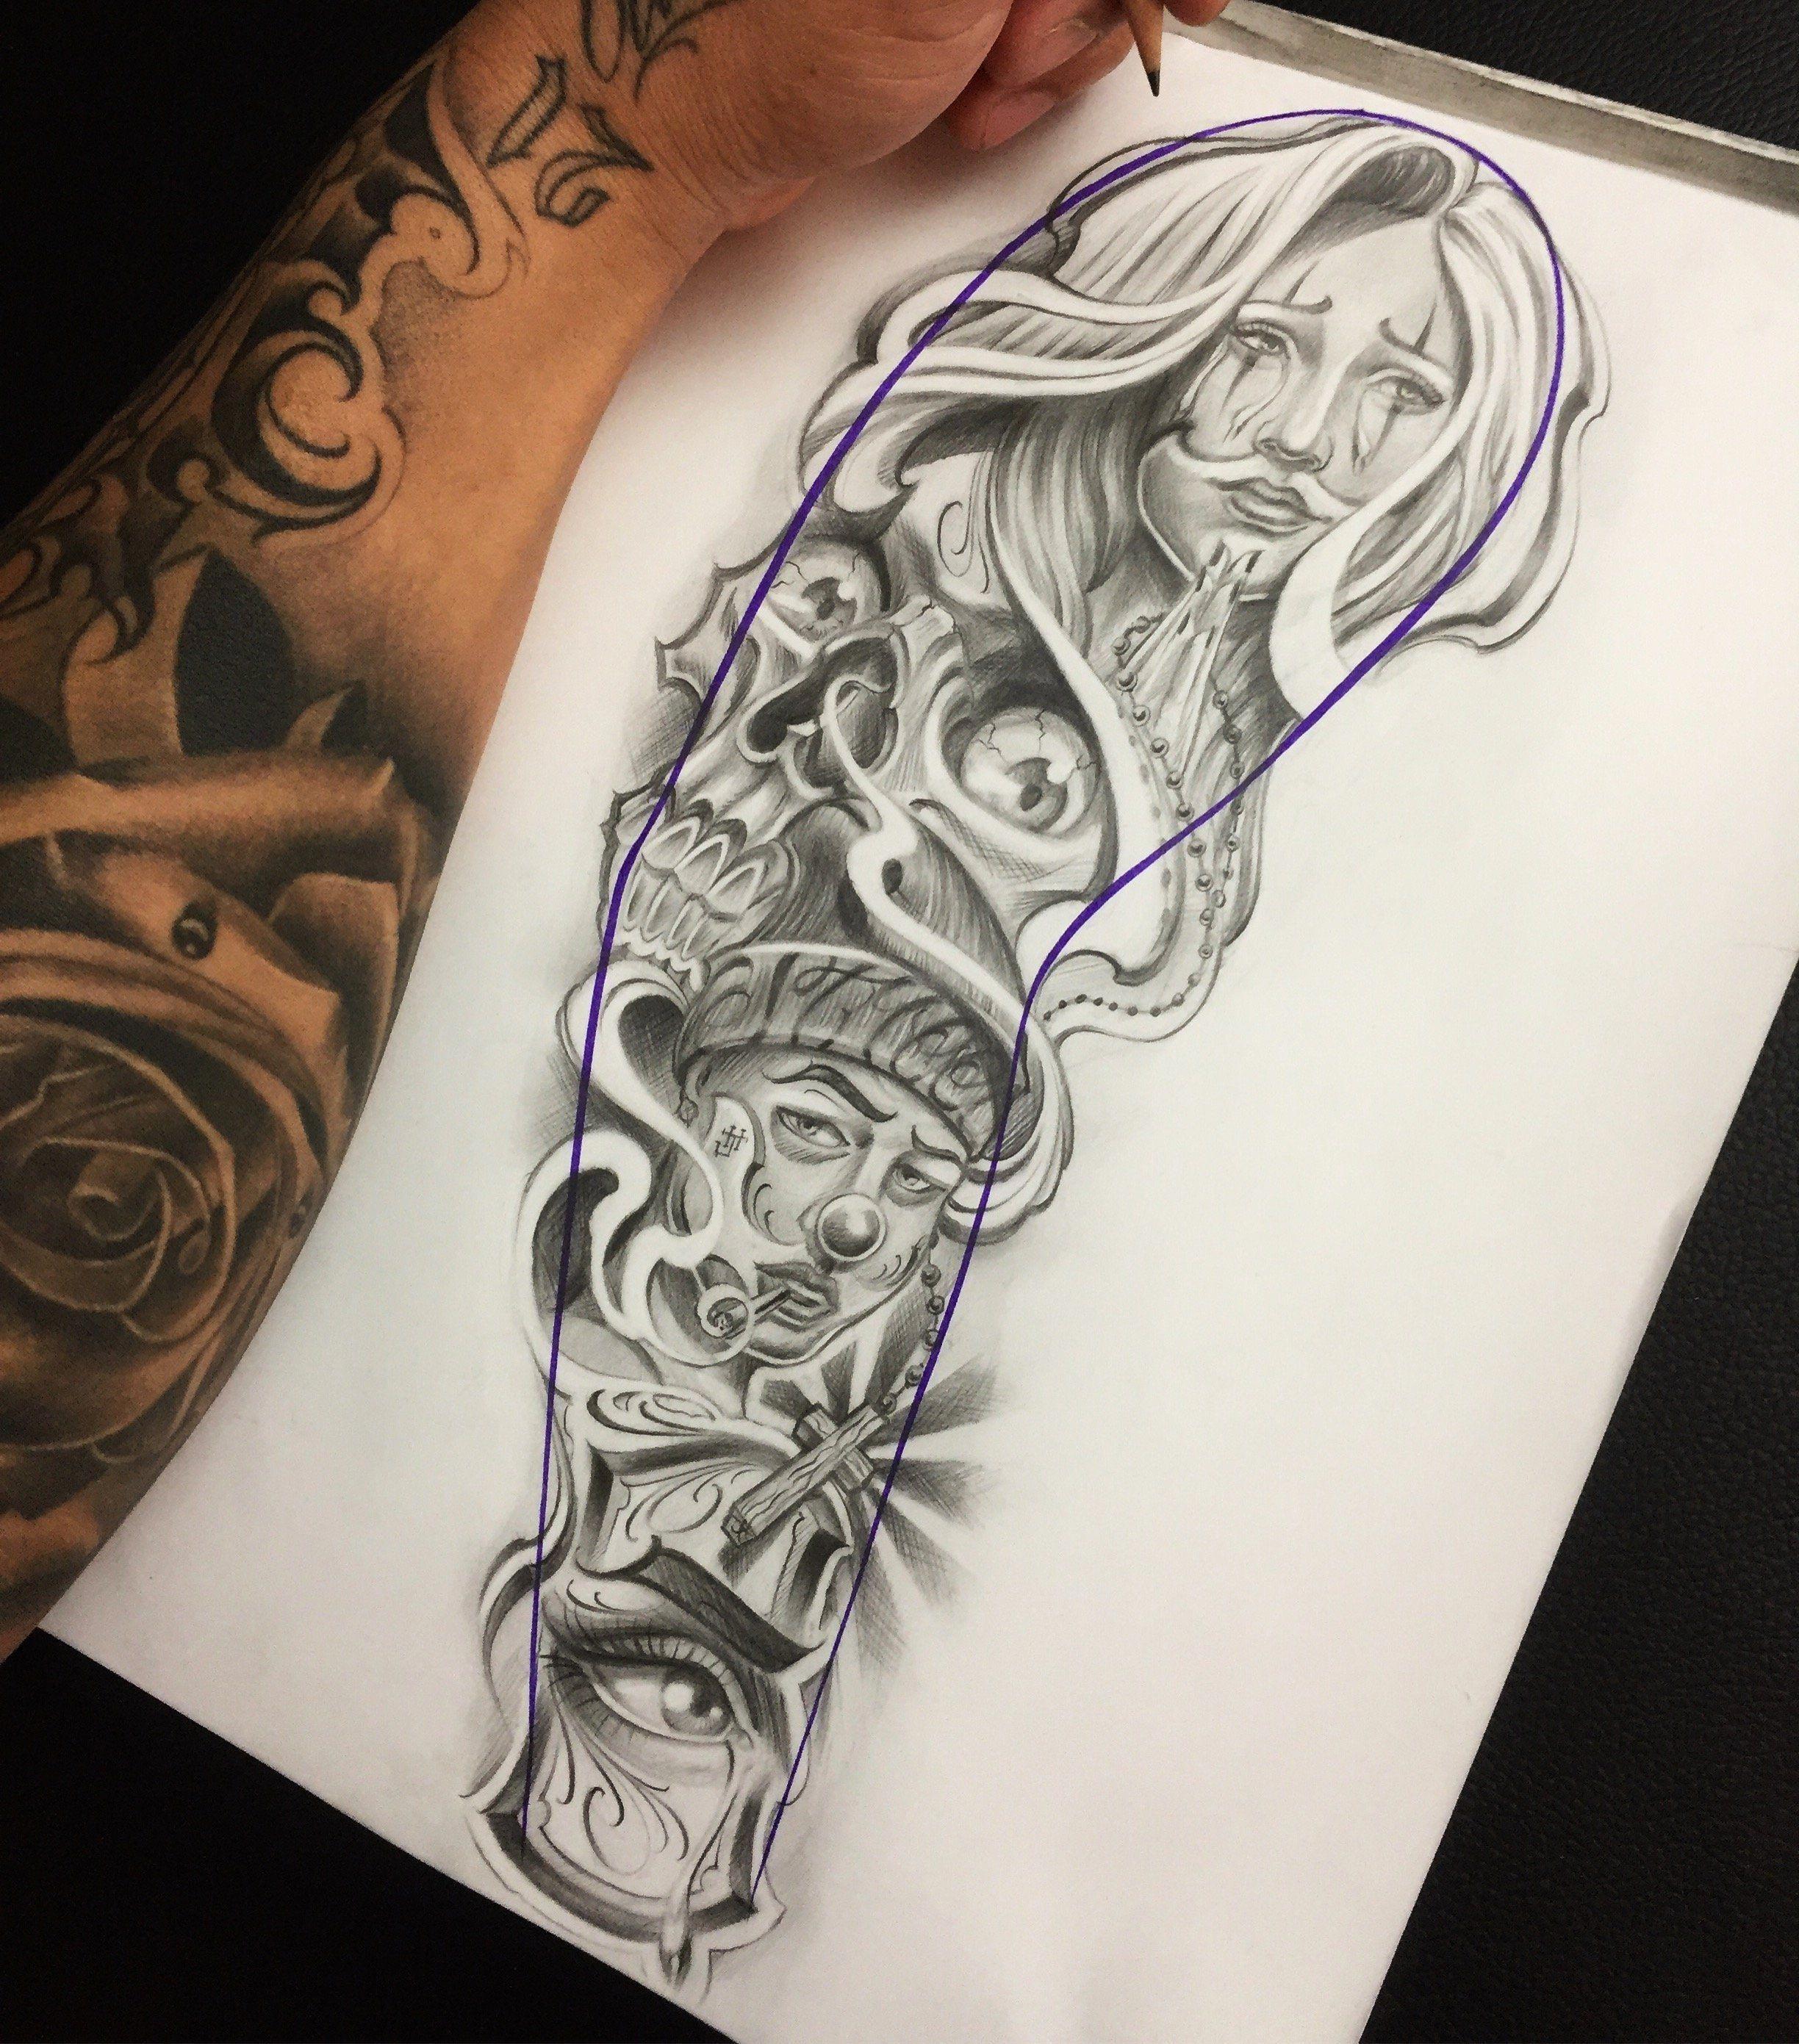 Tattoo Ideen Kompletter Arm Make Up Trends